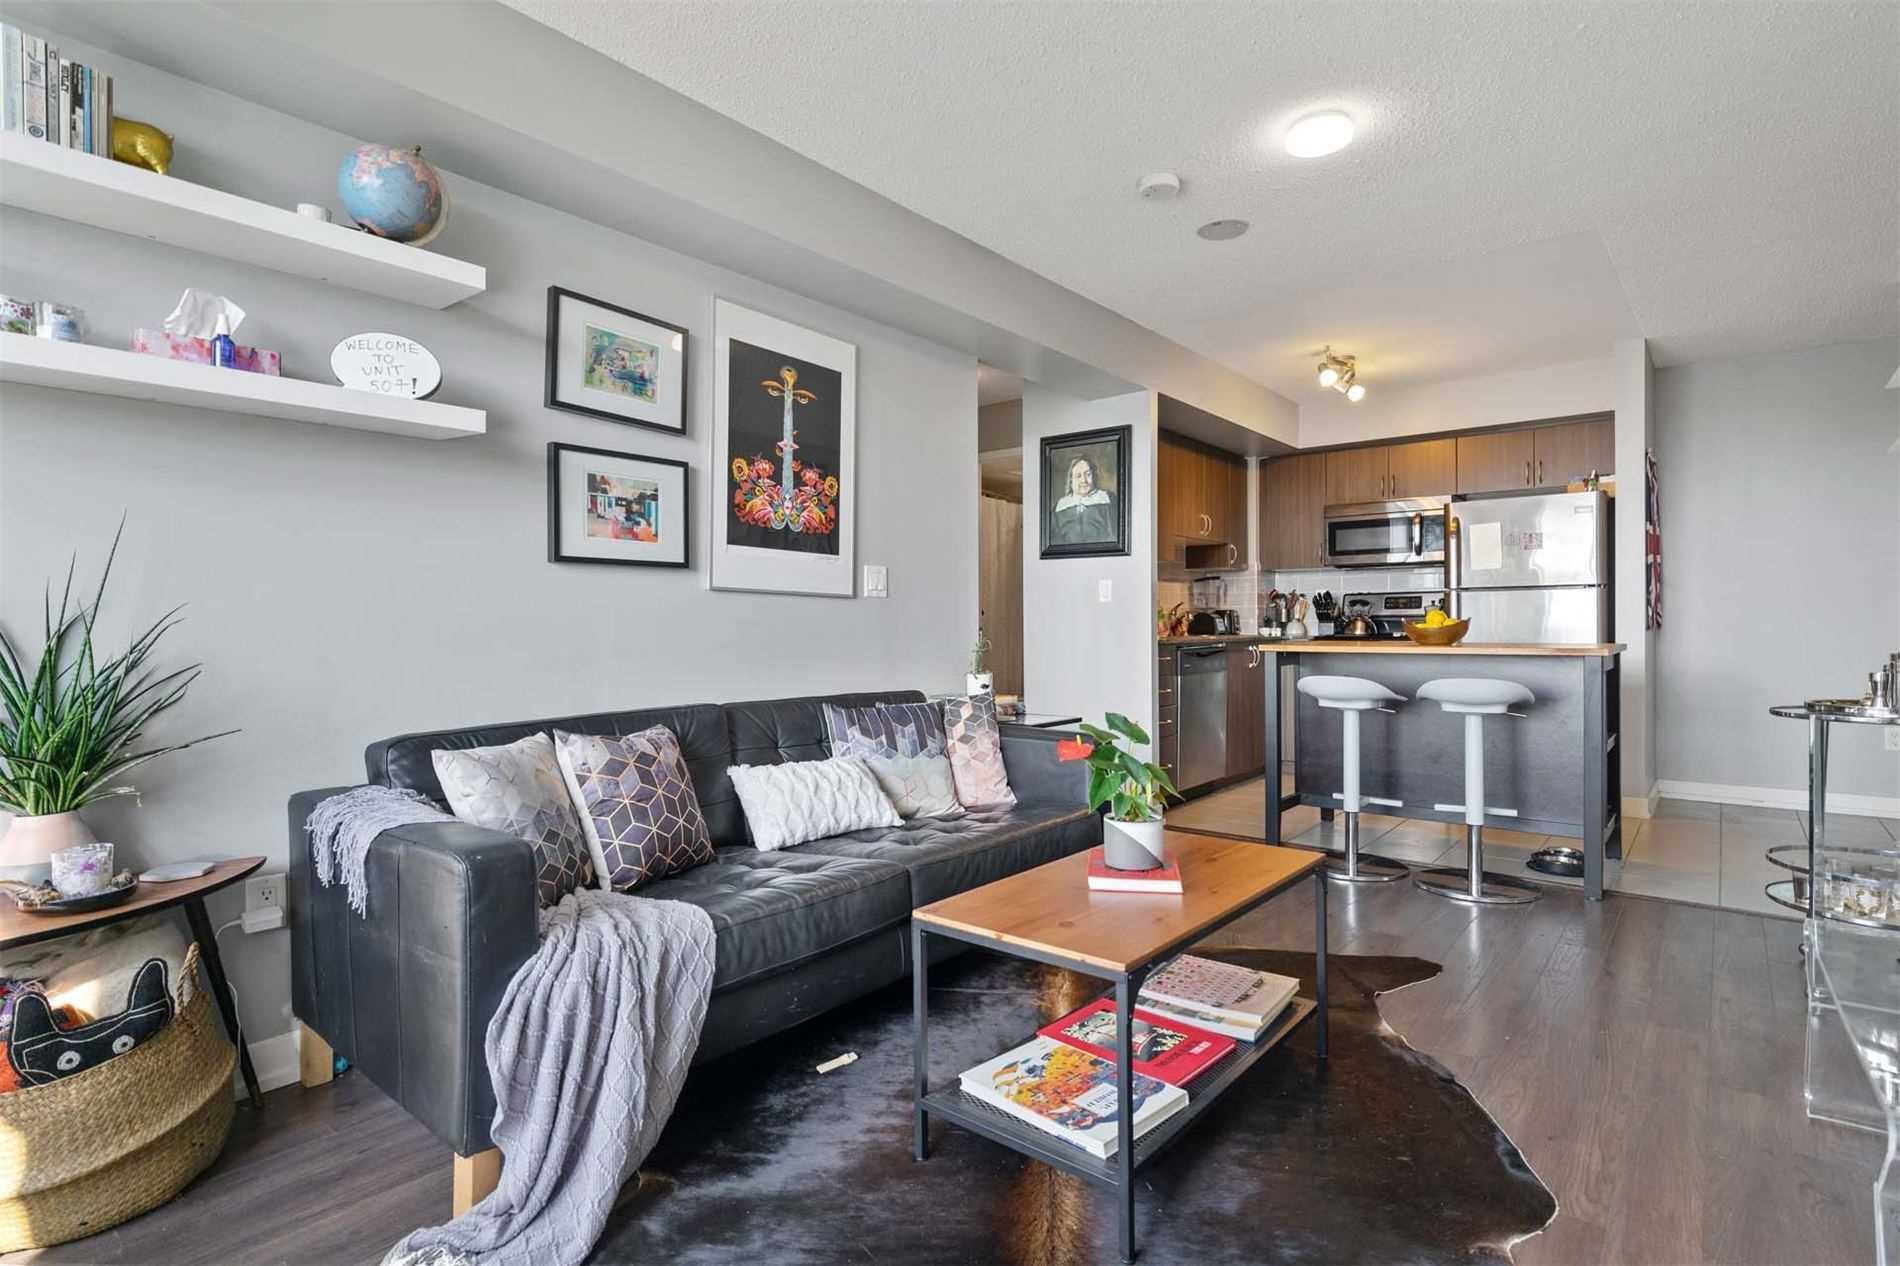 812 Lansdowne Ave, Toronto, Ontario M6H4K5, 1 Bedroom Bedrooms, 4 Rooms Rooms,1 BathroomBathrooms,Condo Apt,For Sale,Lansdowne,W4912772